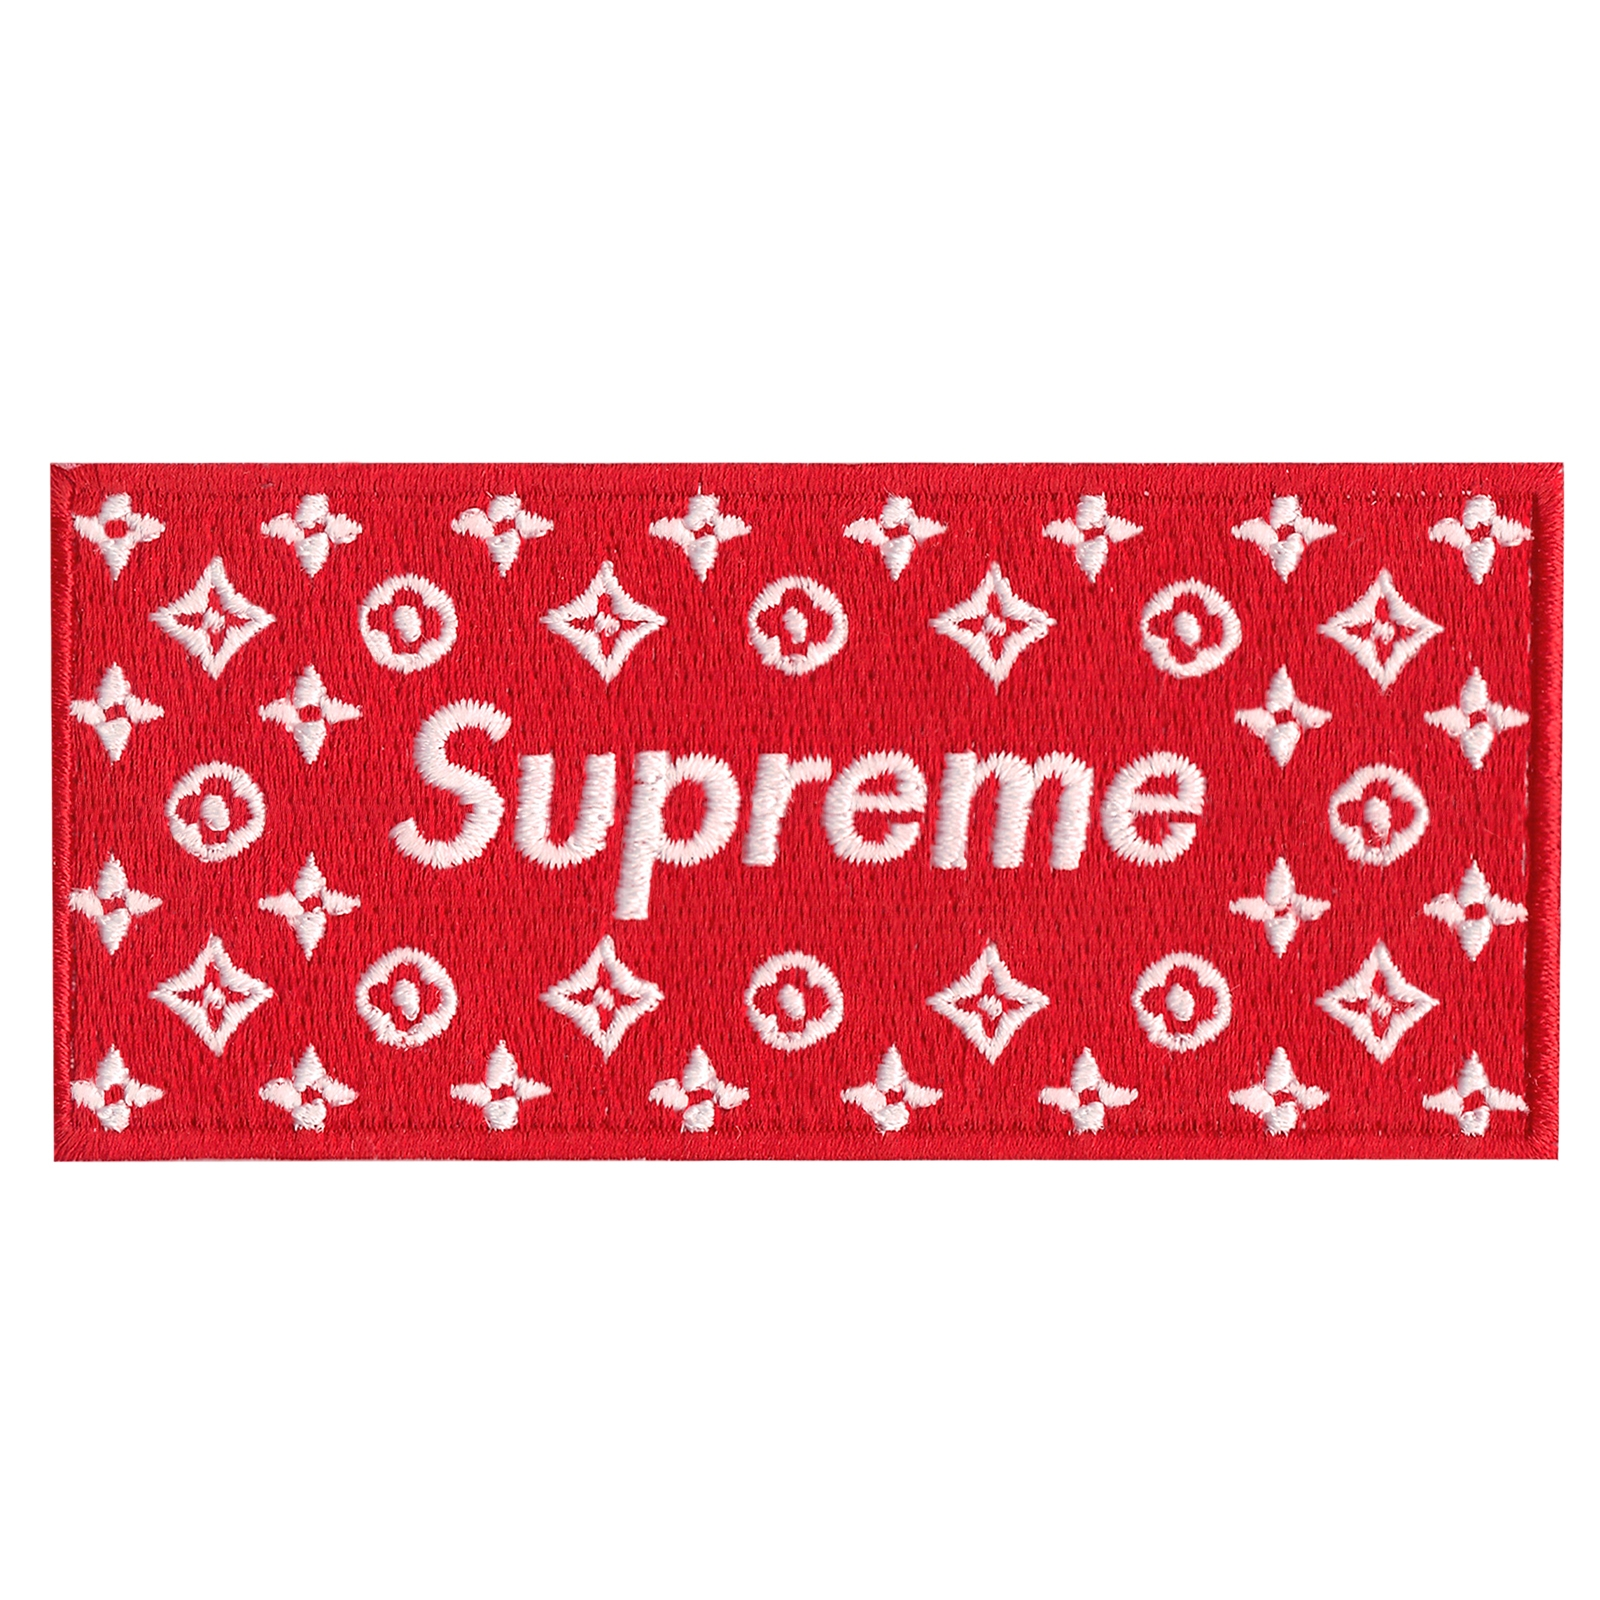 403be727a0246d Red Supreme LV Box Logo Iron On Applique Patch - Walmart.com